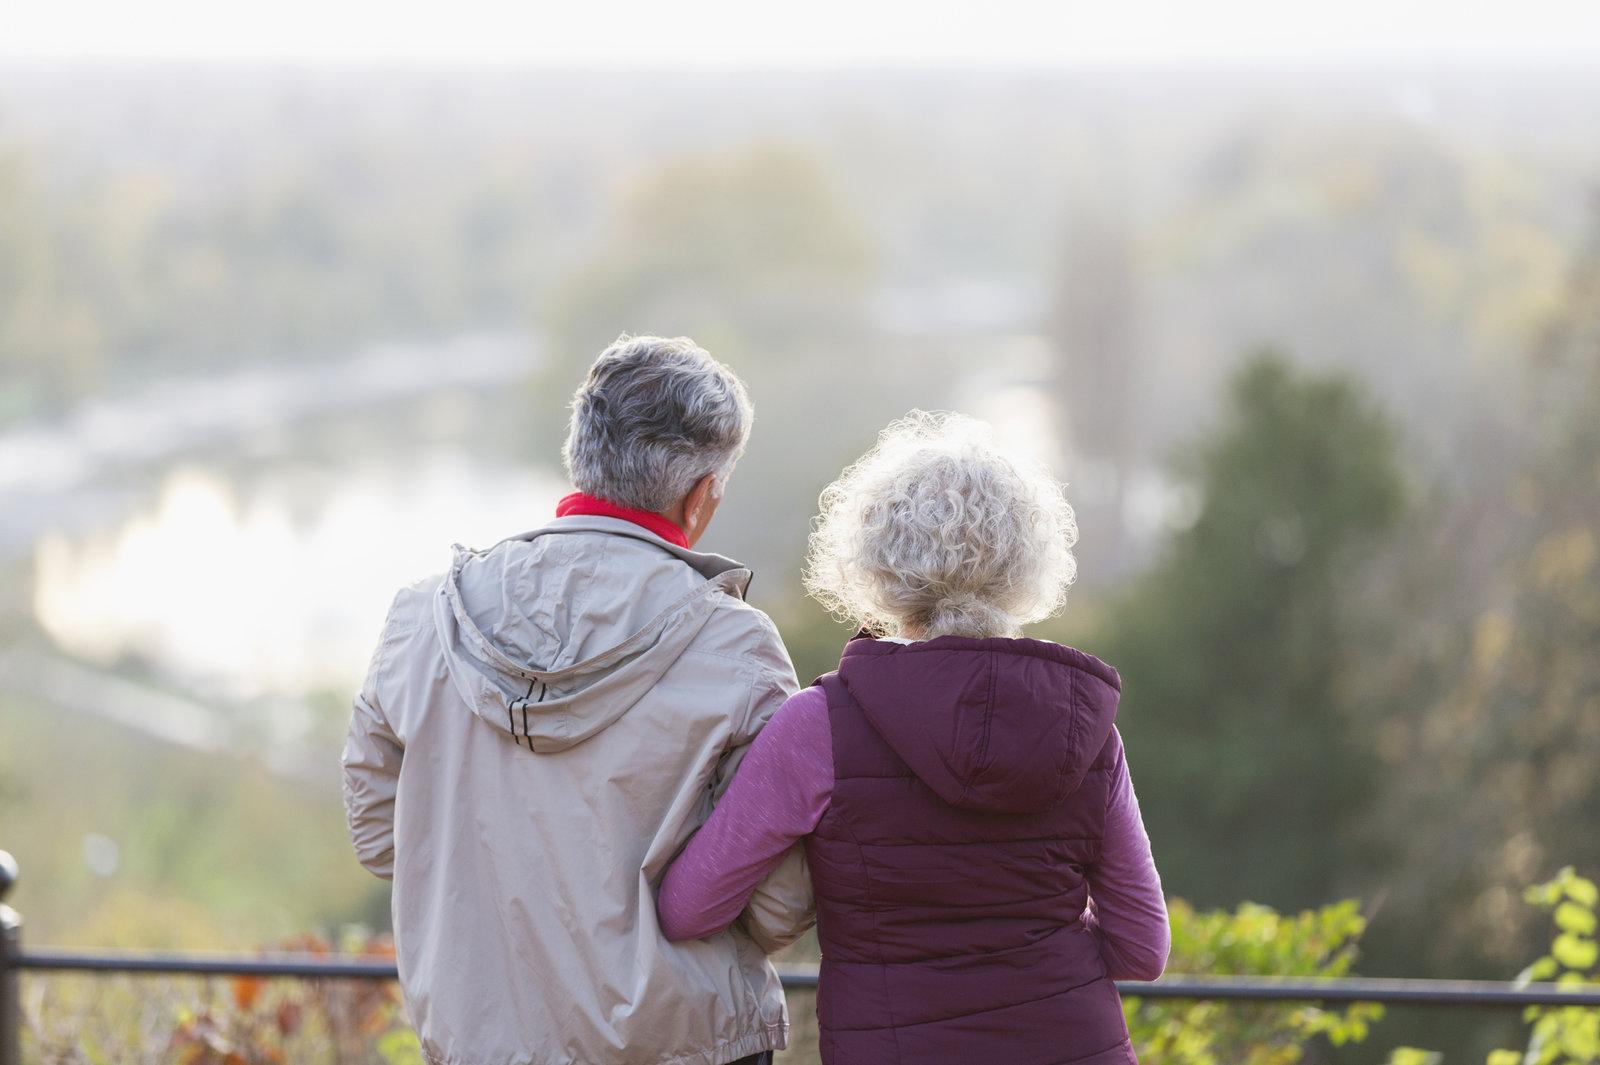 Researchers Explore Why Women's Alzheimer's Risk Is Higher Than Men's